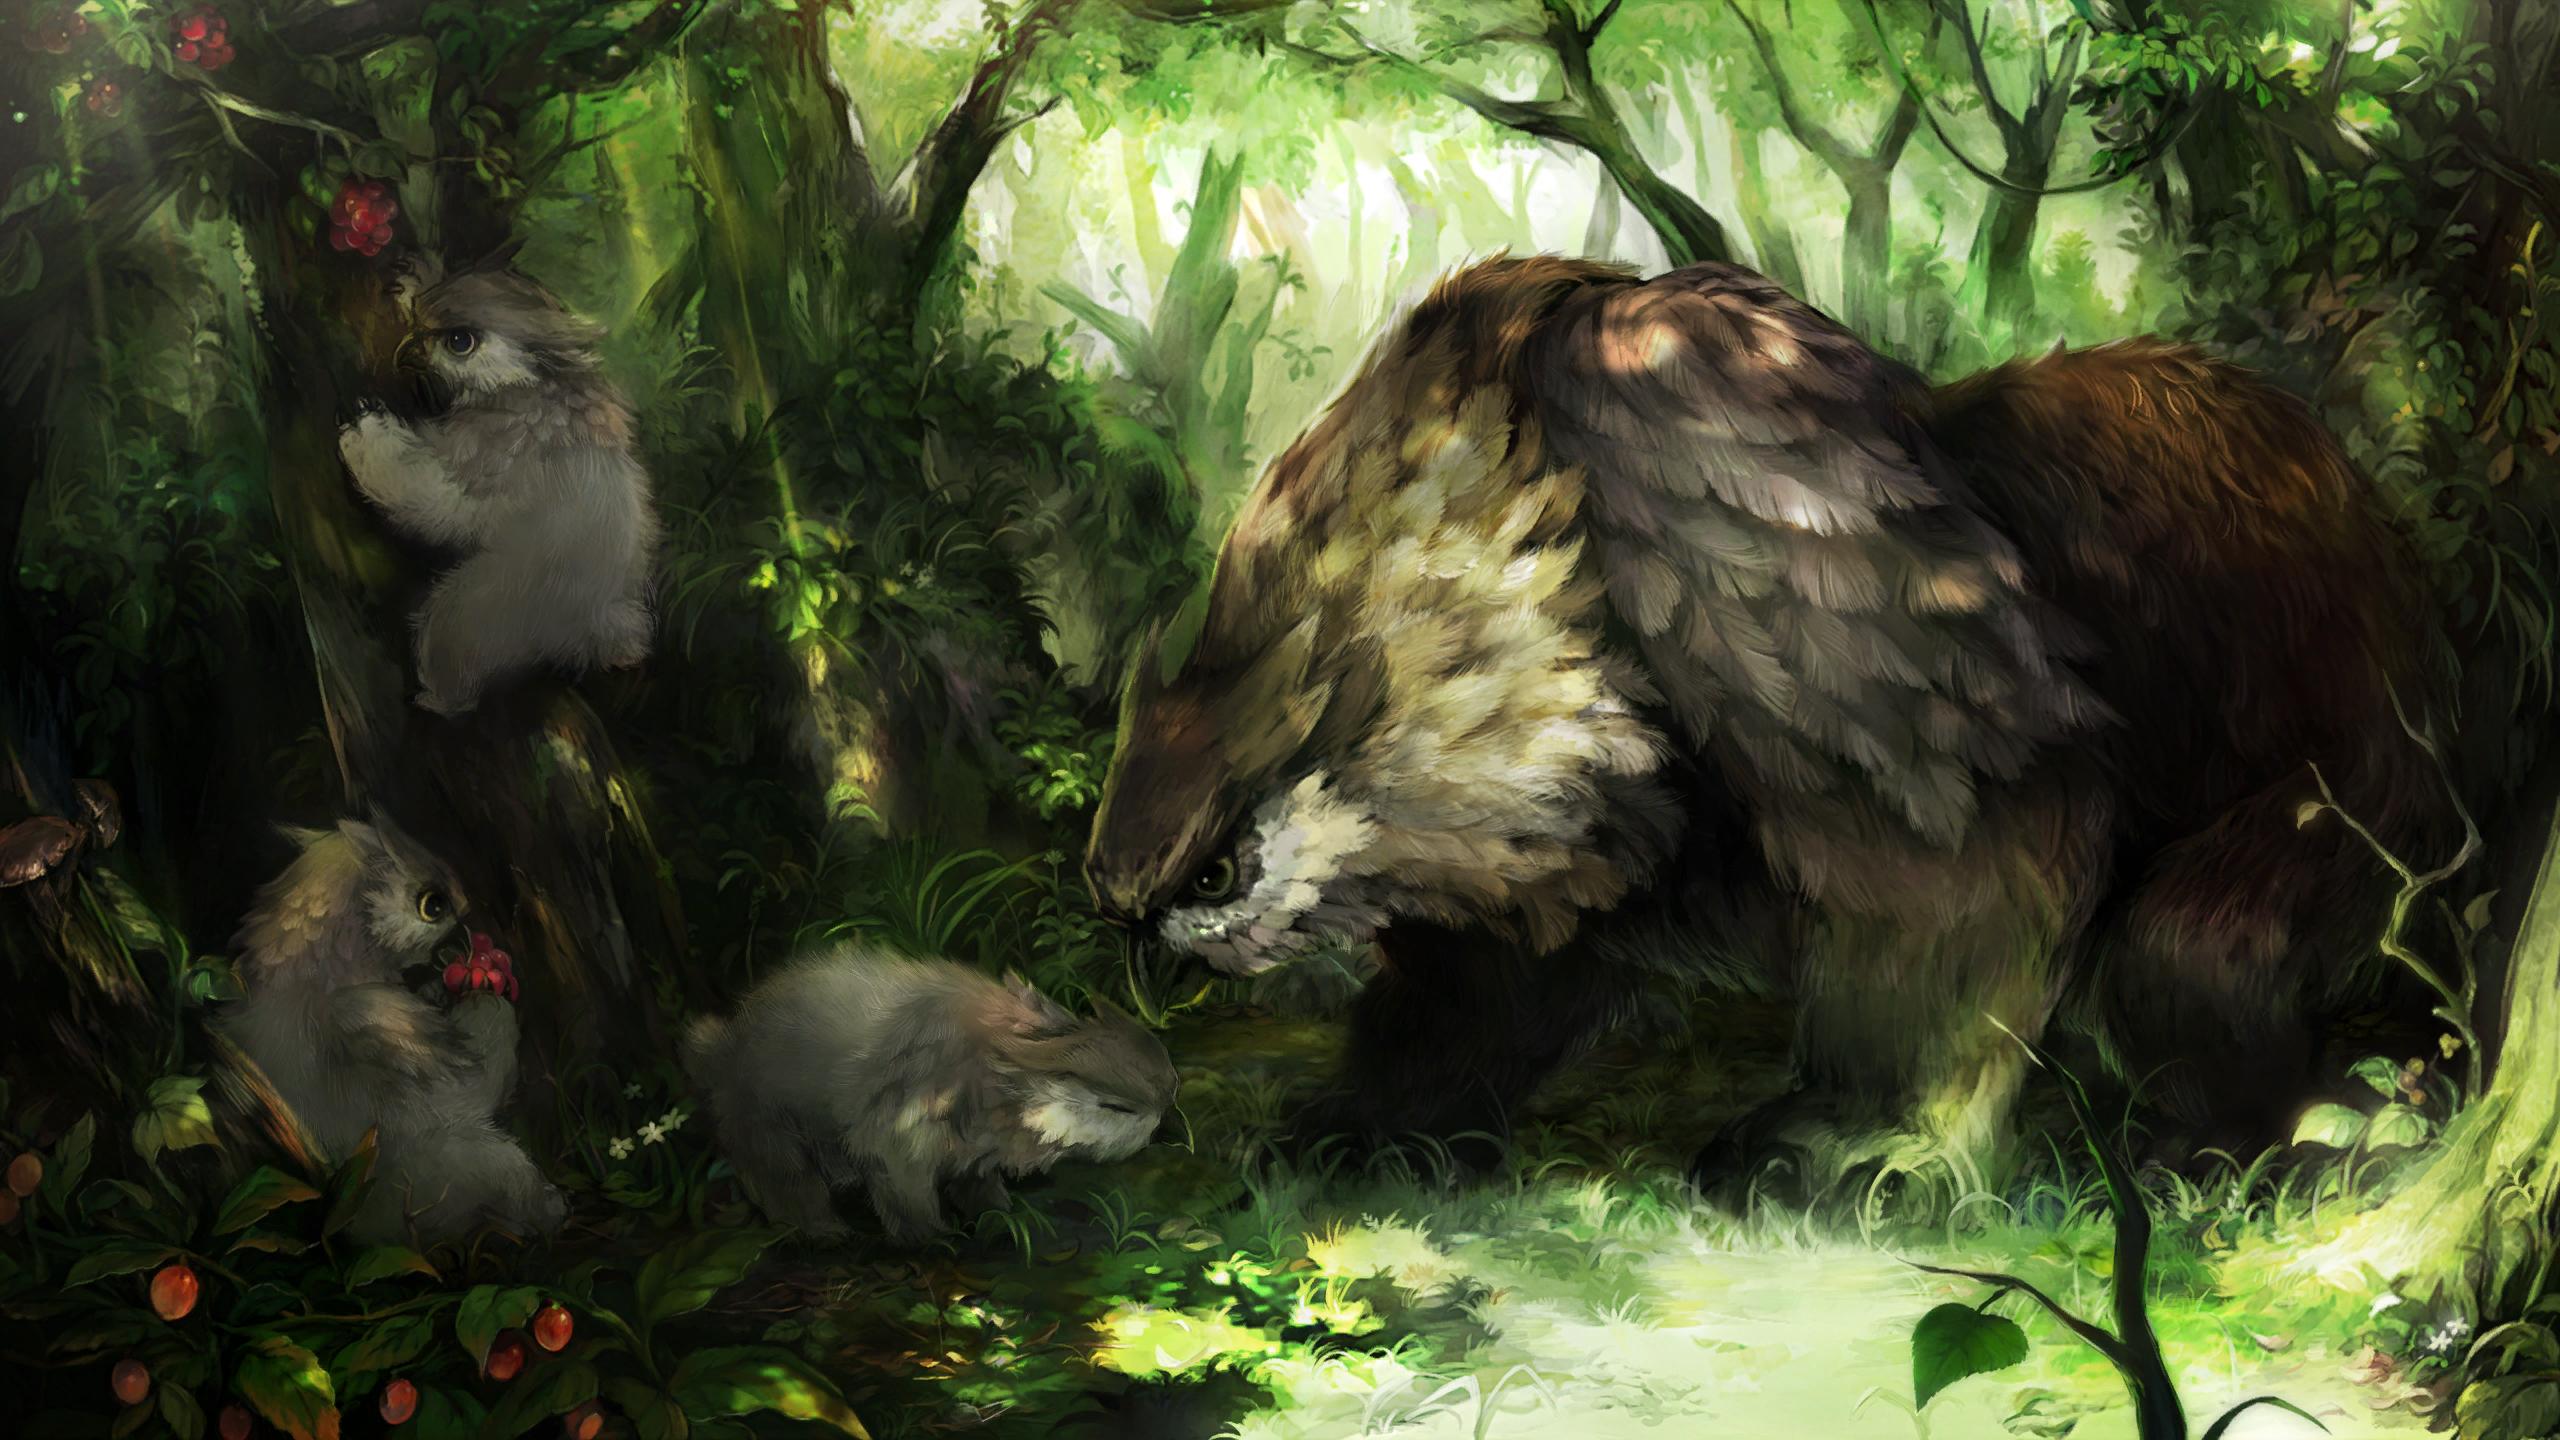 Owlbear Parent and Cub